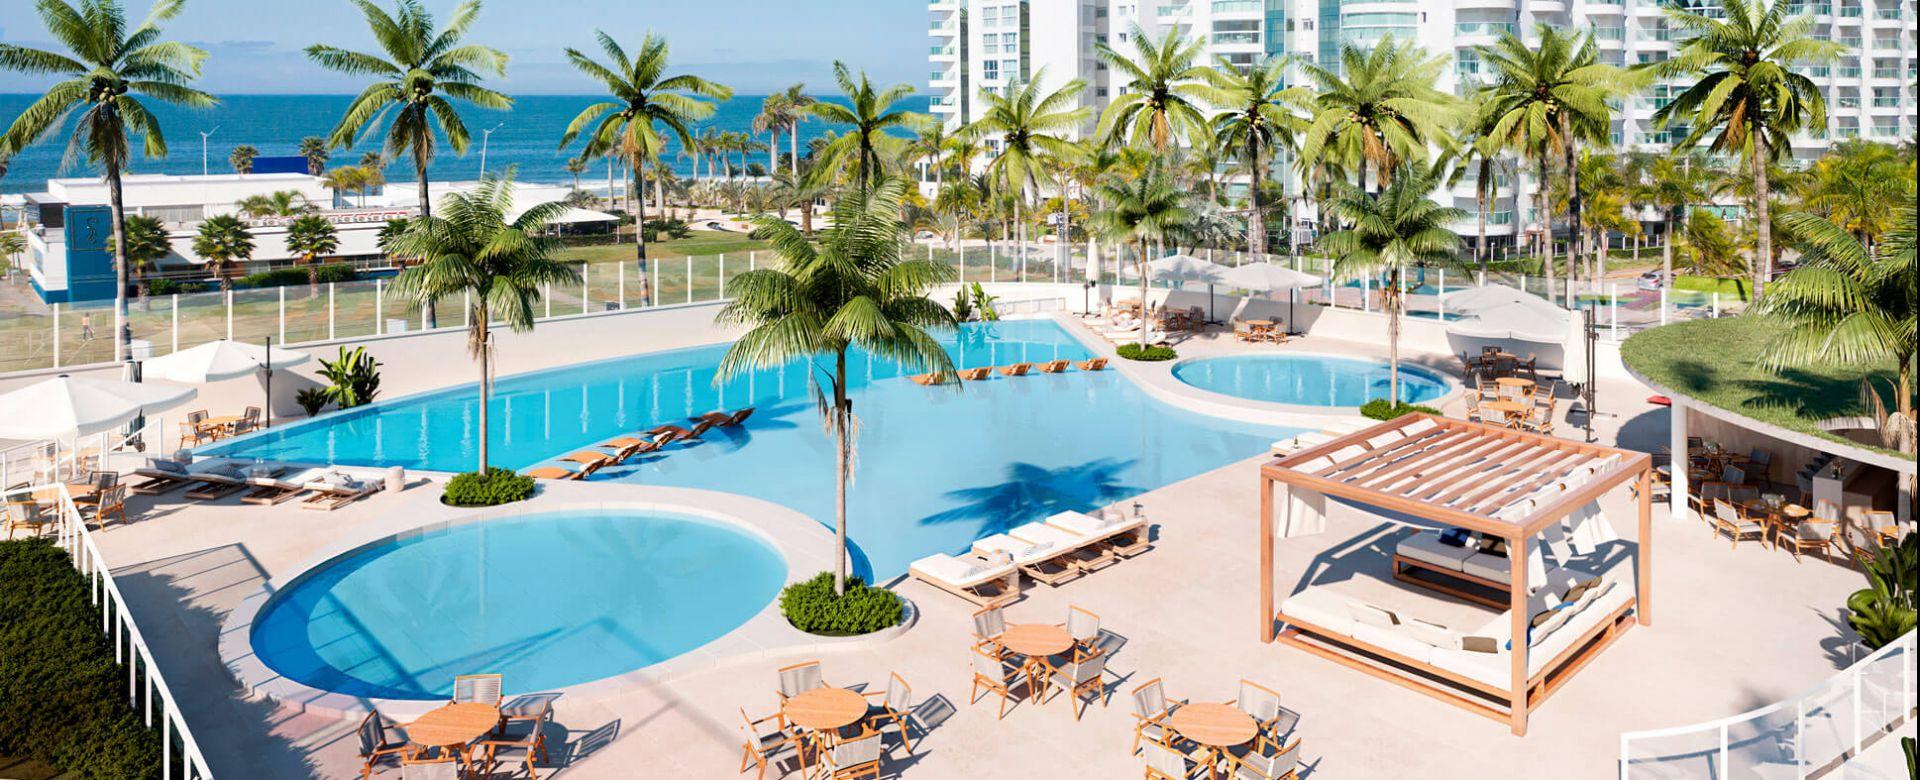 Reserva Figueira Residence – Brava Beach Internacional, foto 1